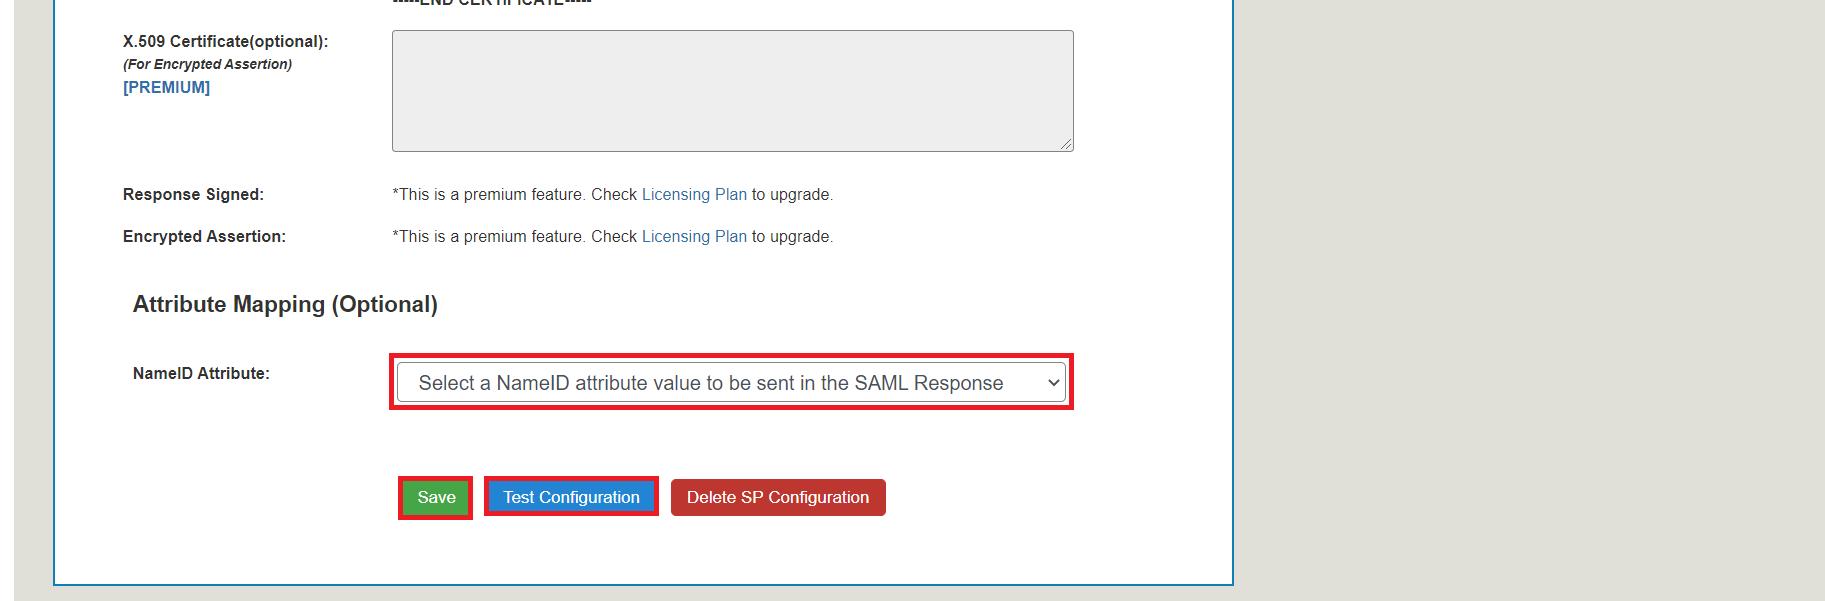 serivice provider setup tab